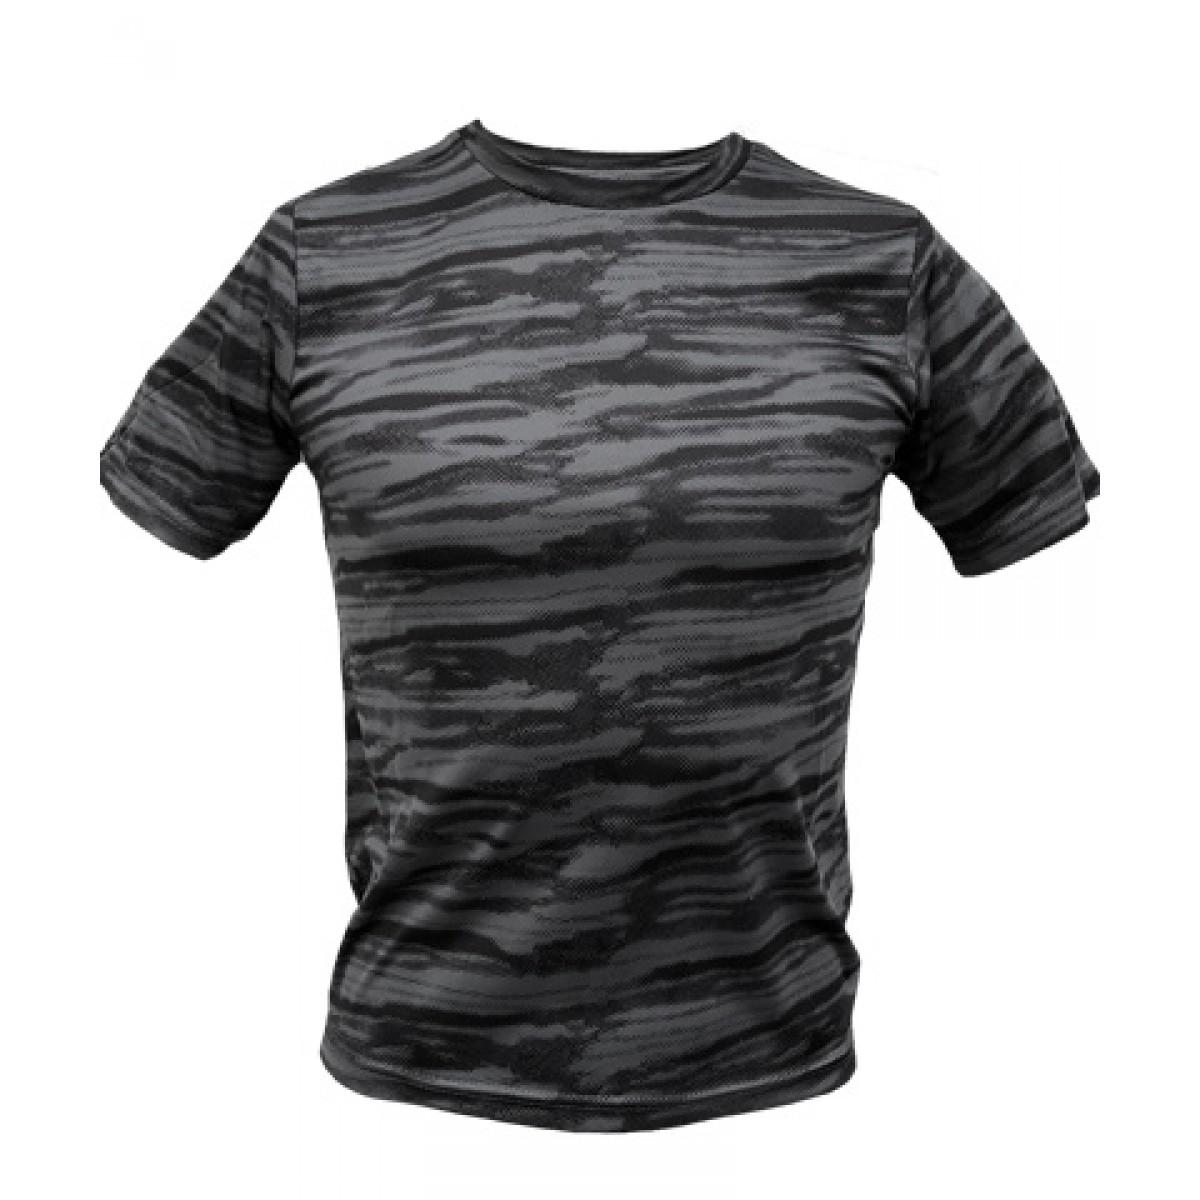 Dark Gray Camo Short Sleeve